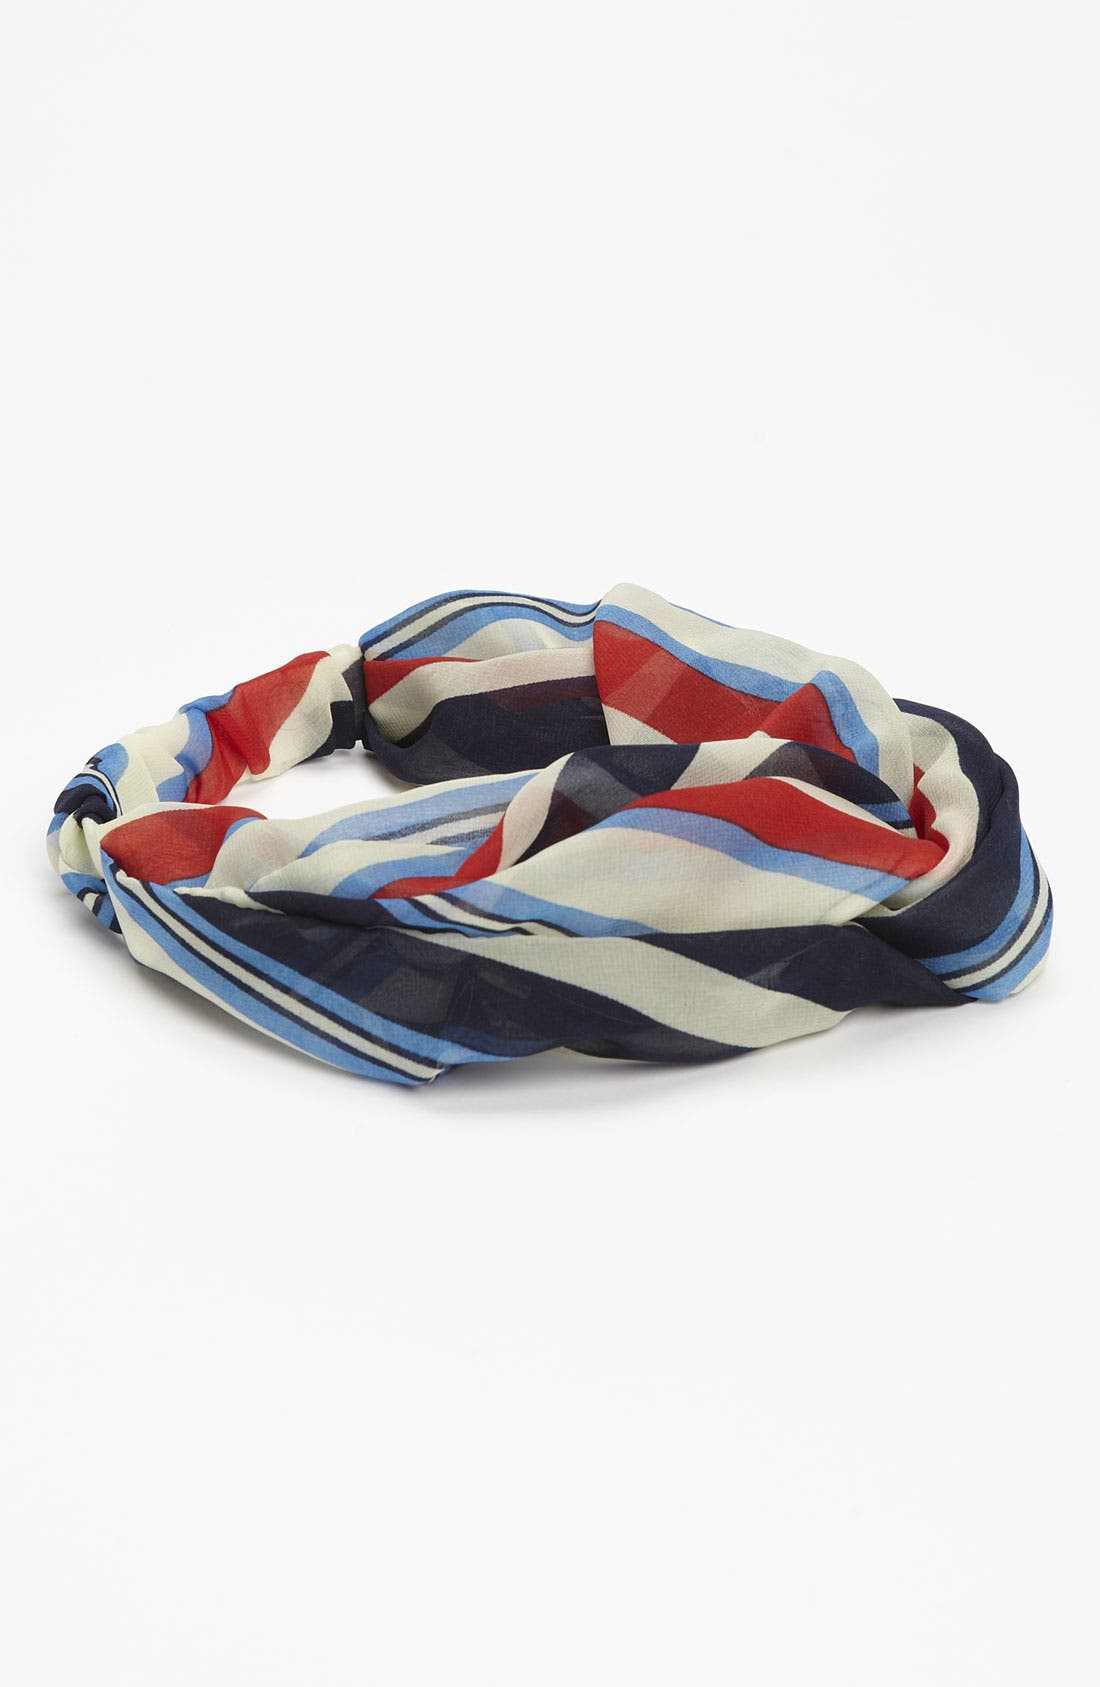 Alternate Image 1 Selected - Lulu Sheer Chiffon Twist Front Headband